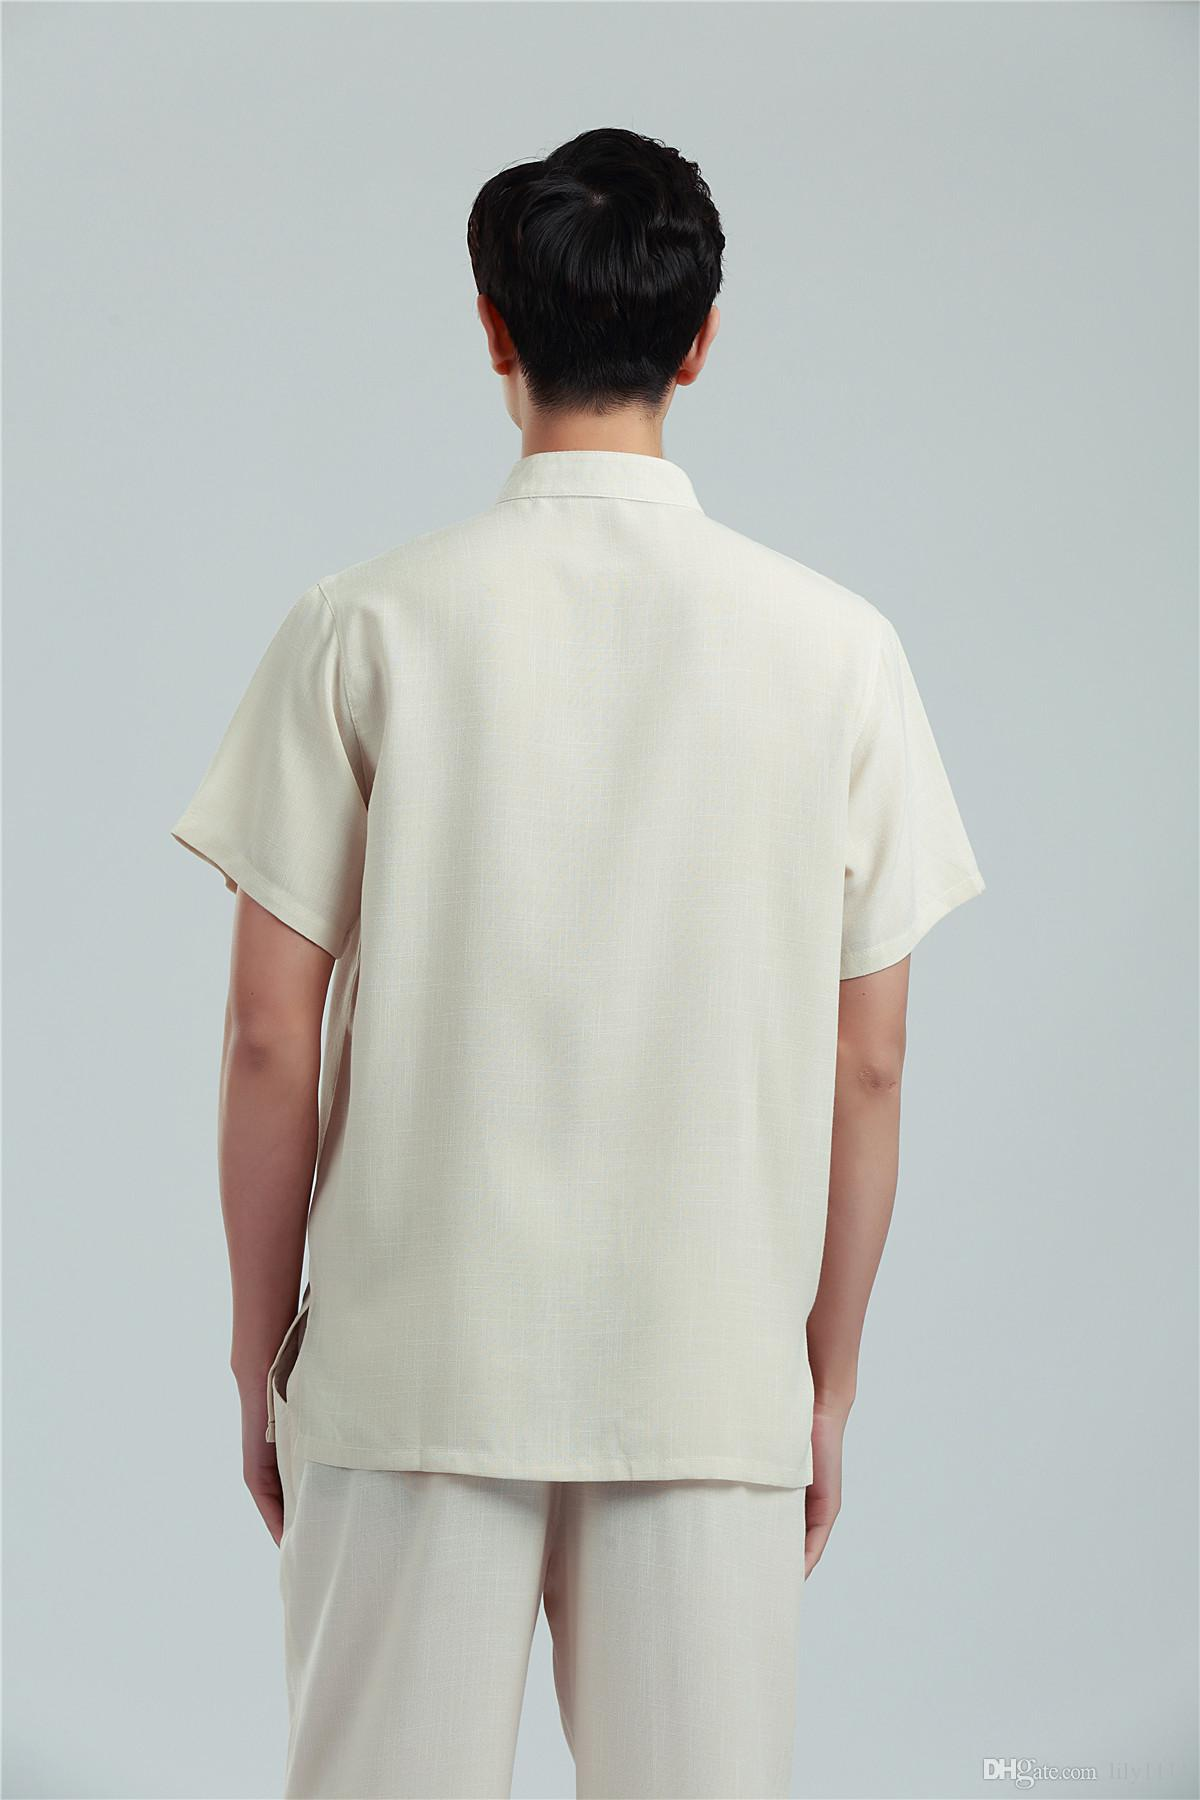 Shanghai Story Short Sleeve traditional chinese clothing for men linen shirt men tai chi shirt tang suit kungfu Shirt hanfu